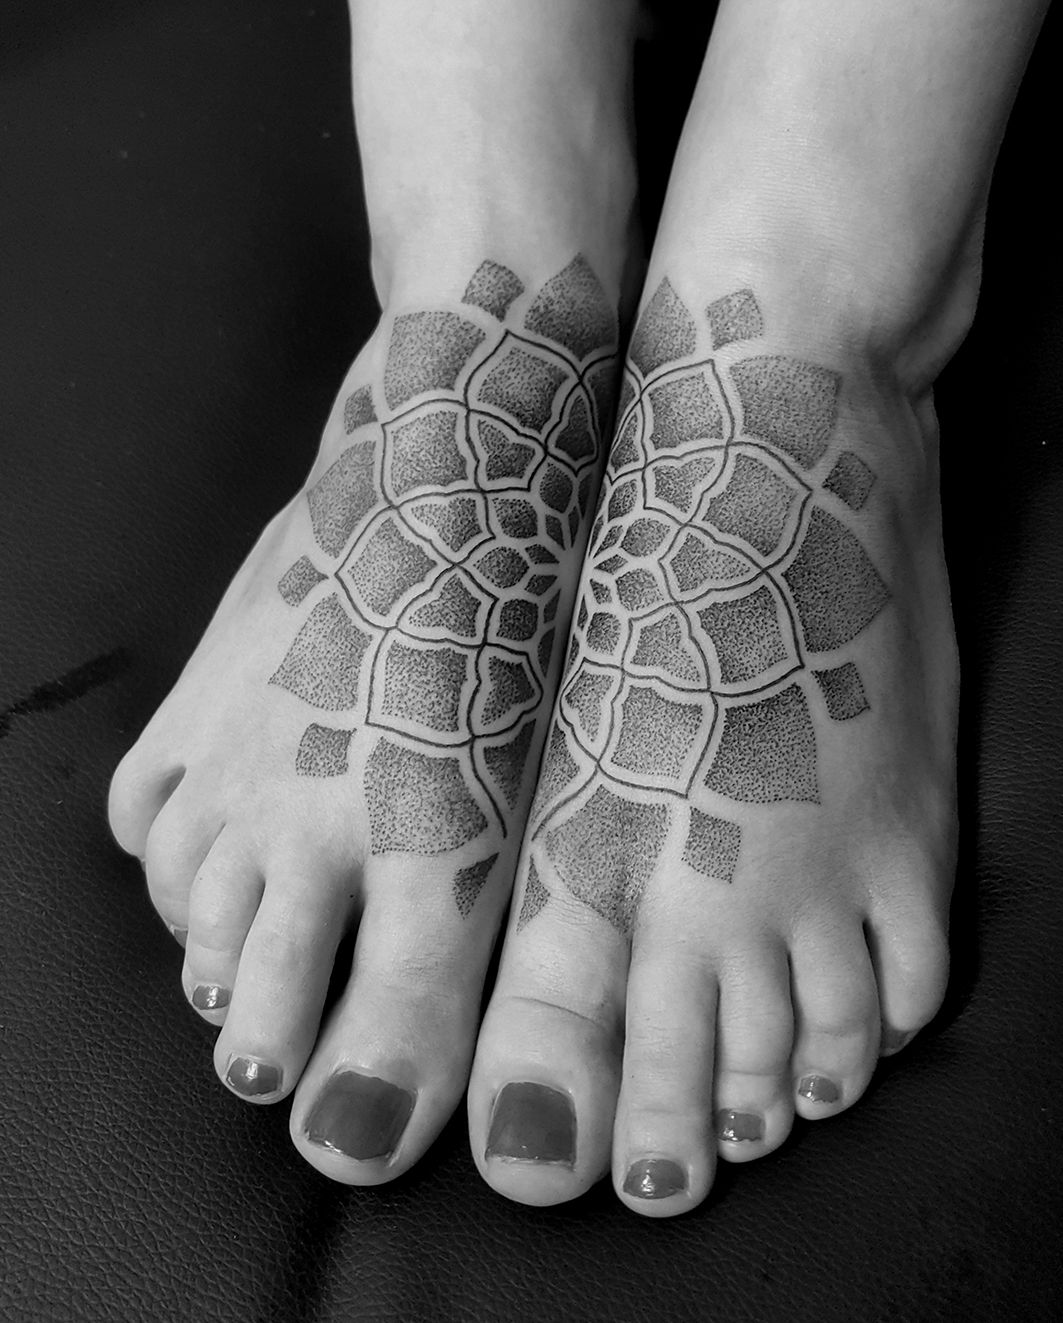 Tattoo Zincik - Mandala half dotwork